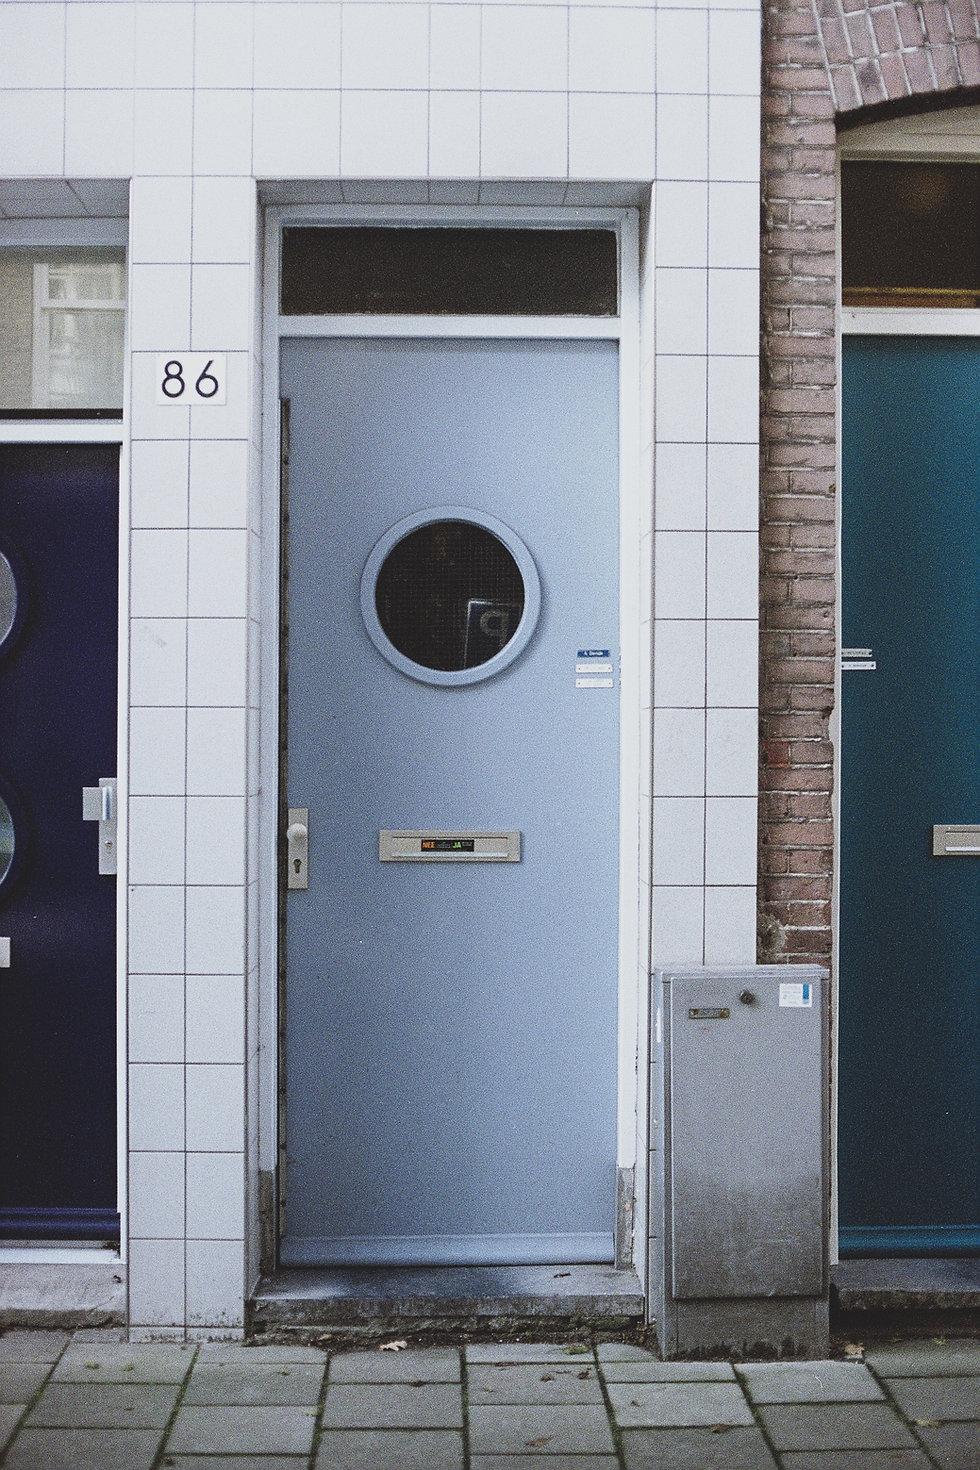 An entrance door of an urban apartment building